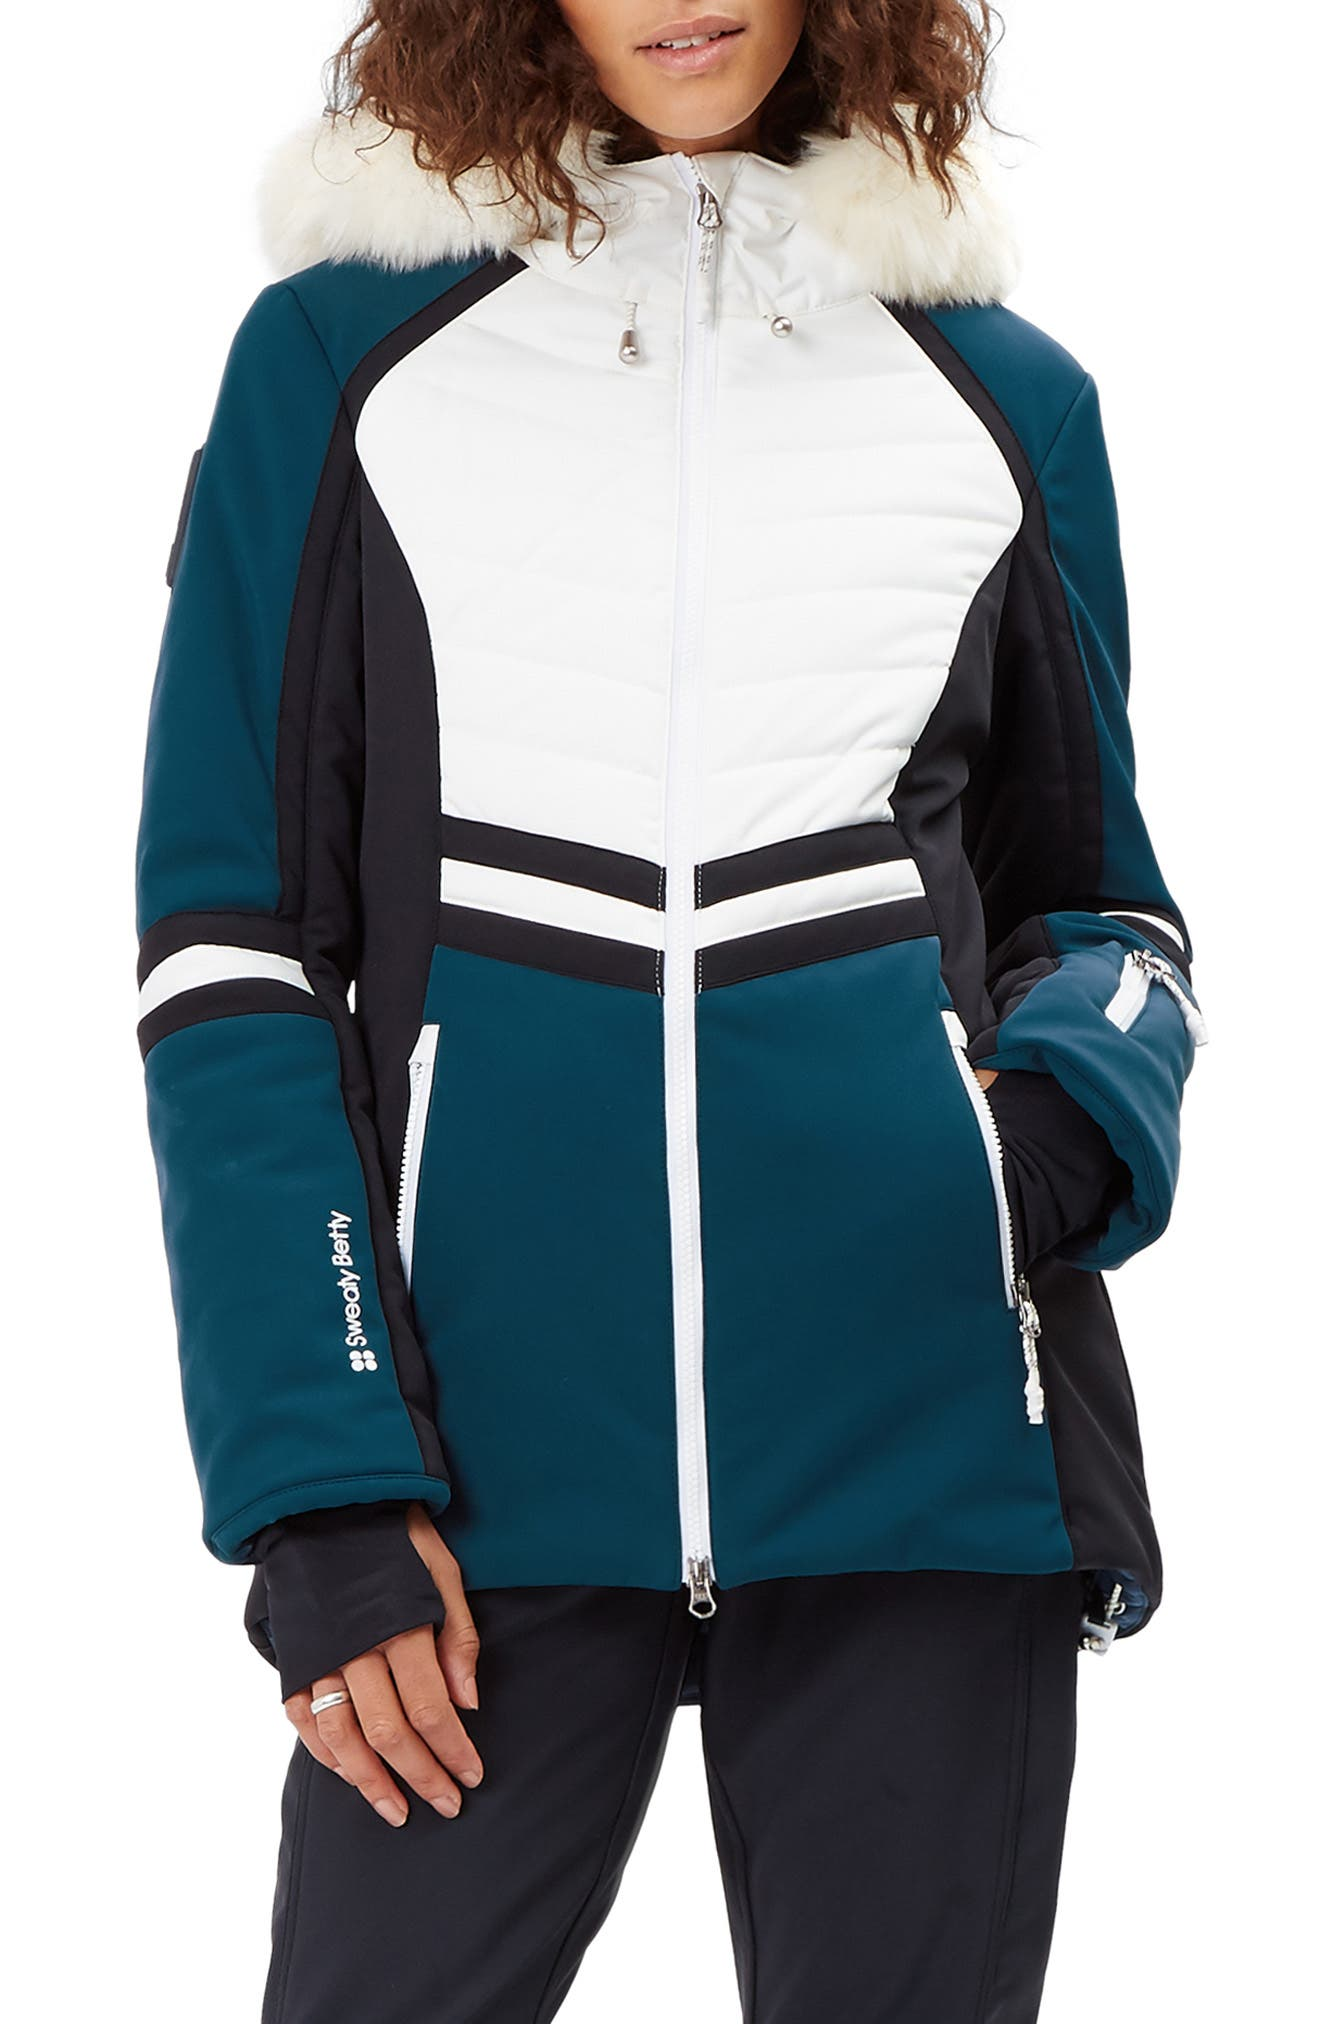 SWEATY BETTY Method Hybrid Waterproof Ski Jacket with Faux Fur, Main, color, BEETLE BLUE COLOUR BLOCK